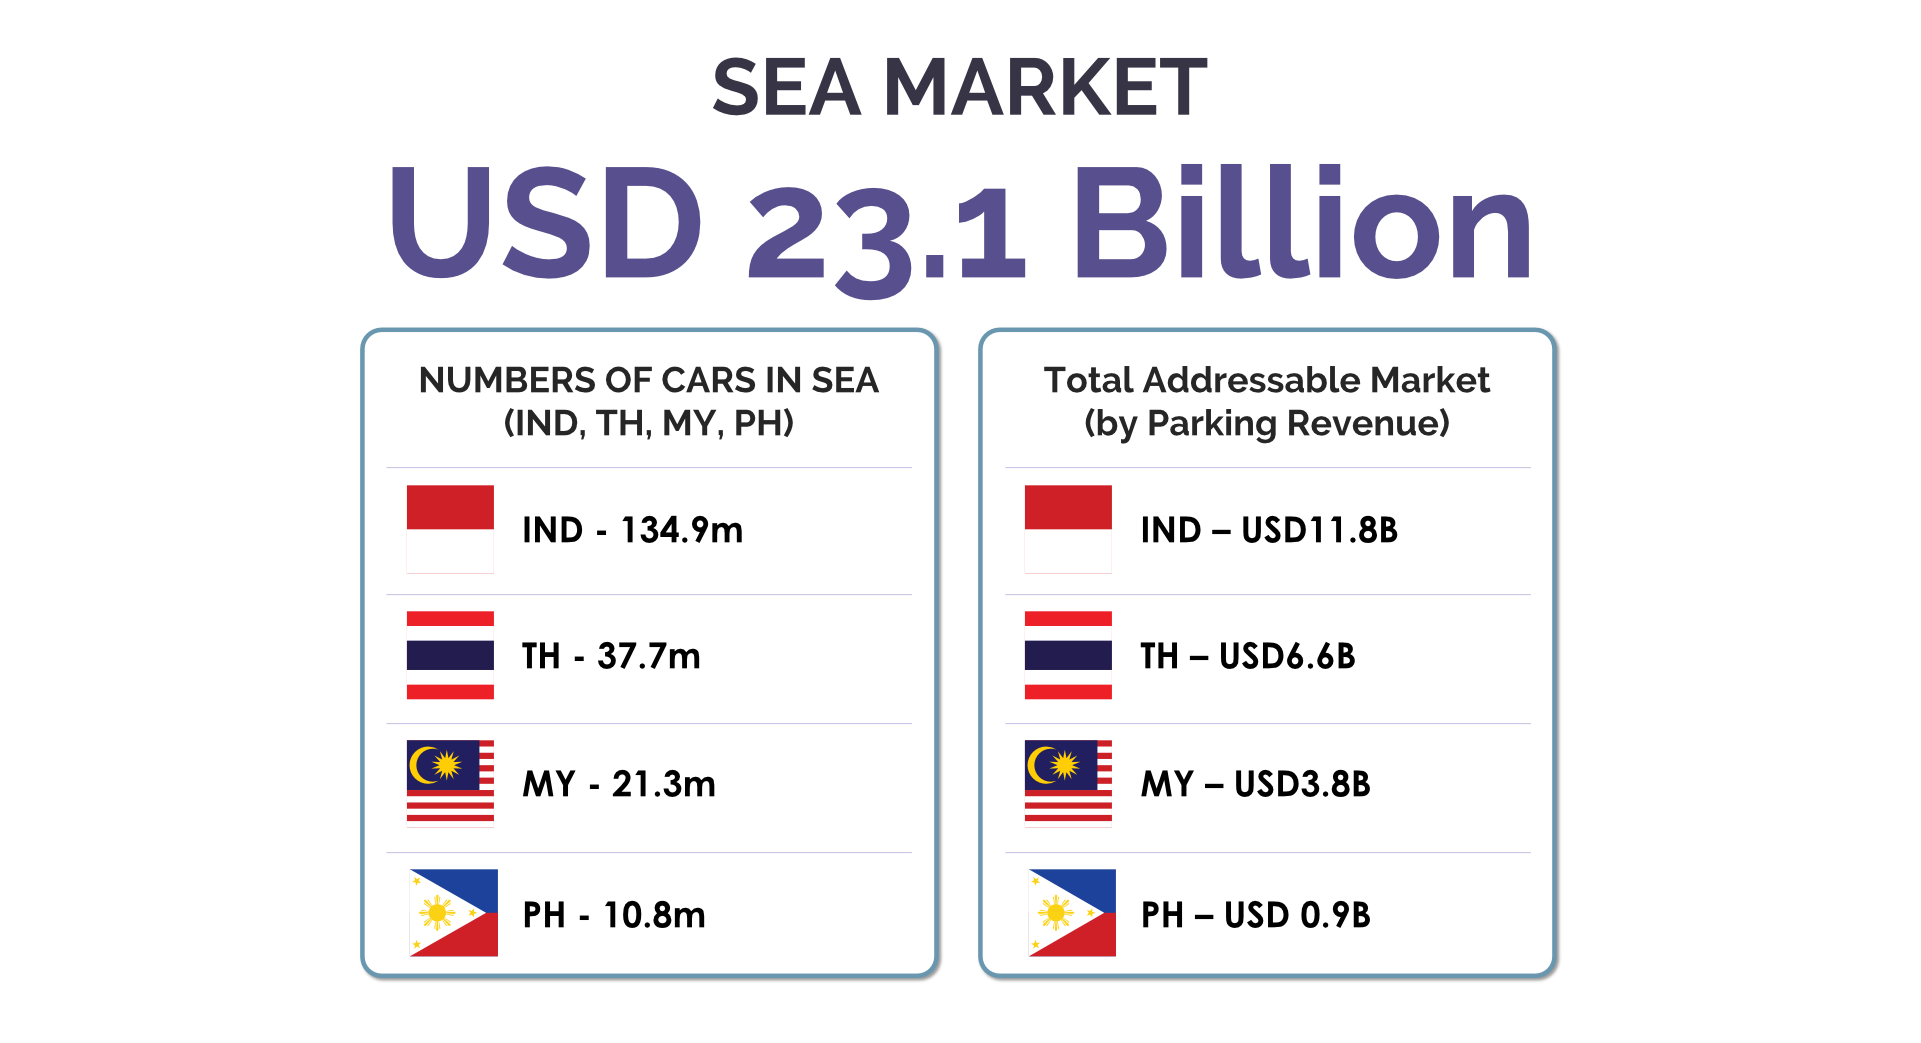 SEA Market